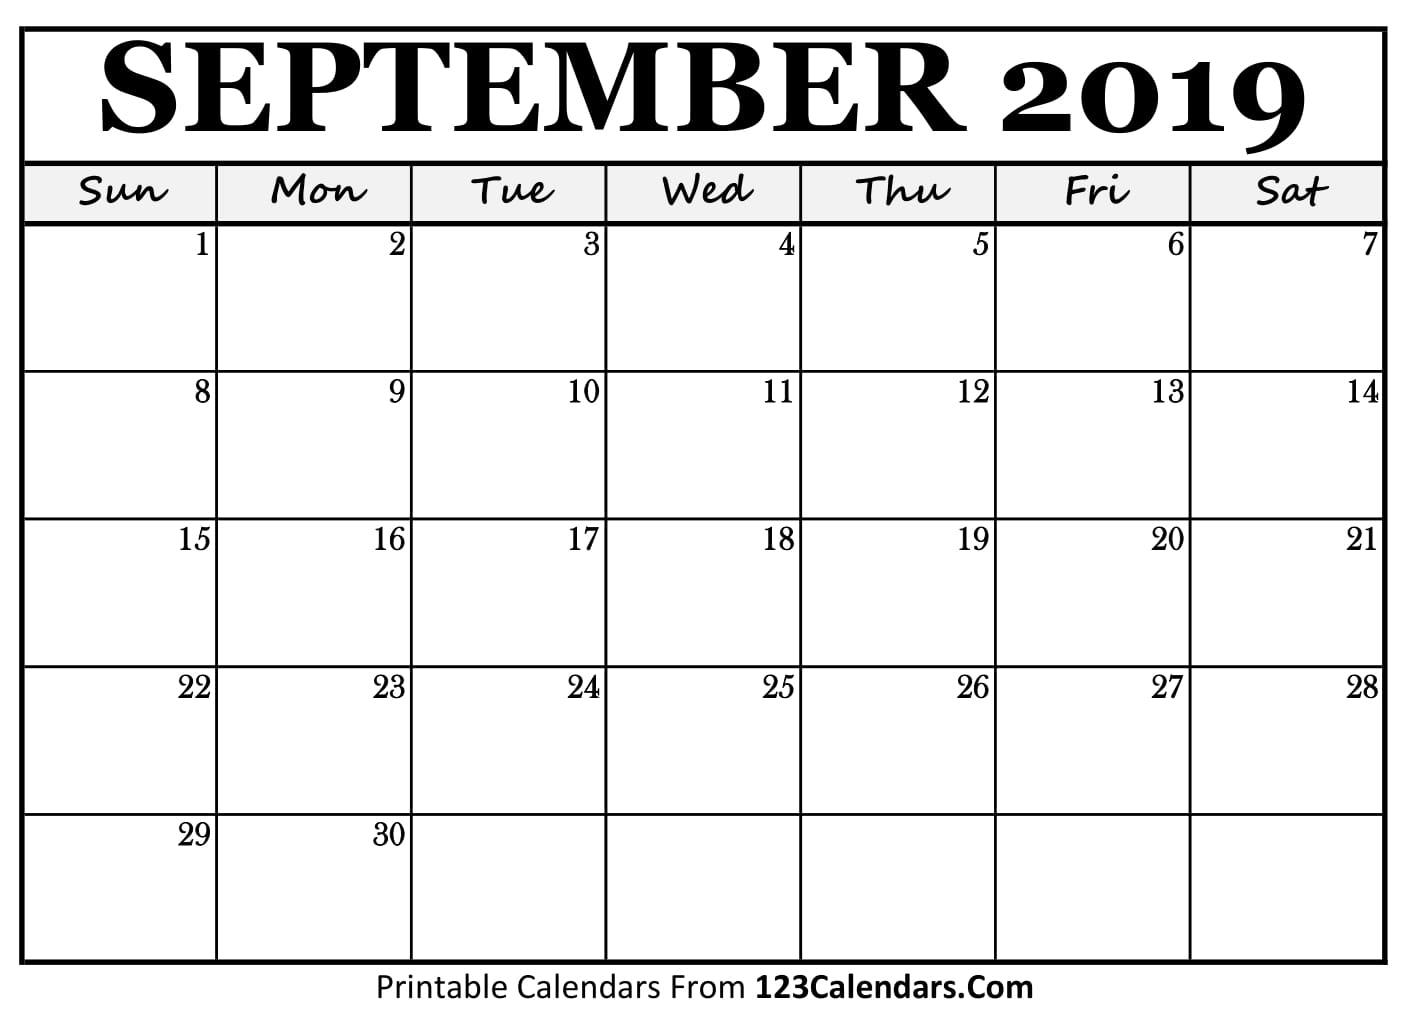 September 2019 Printable Calendar | 123Calendars intended for Blank Printable September Calendar